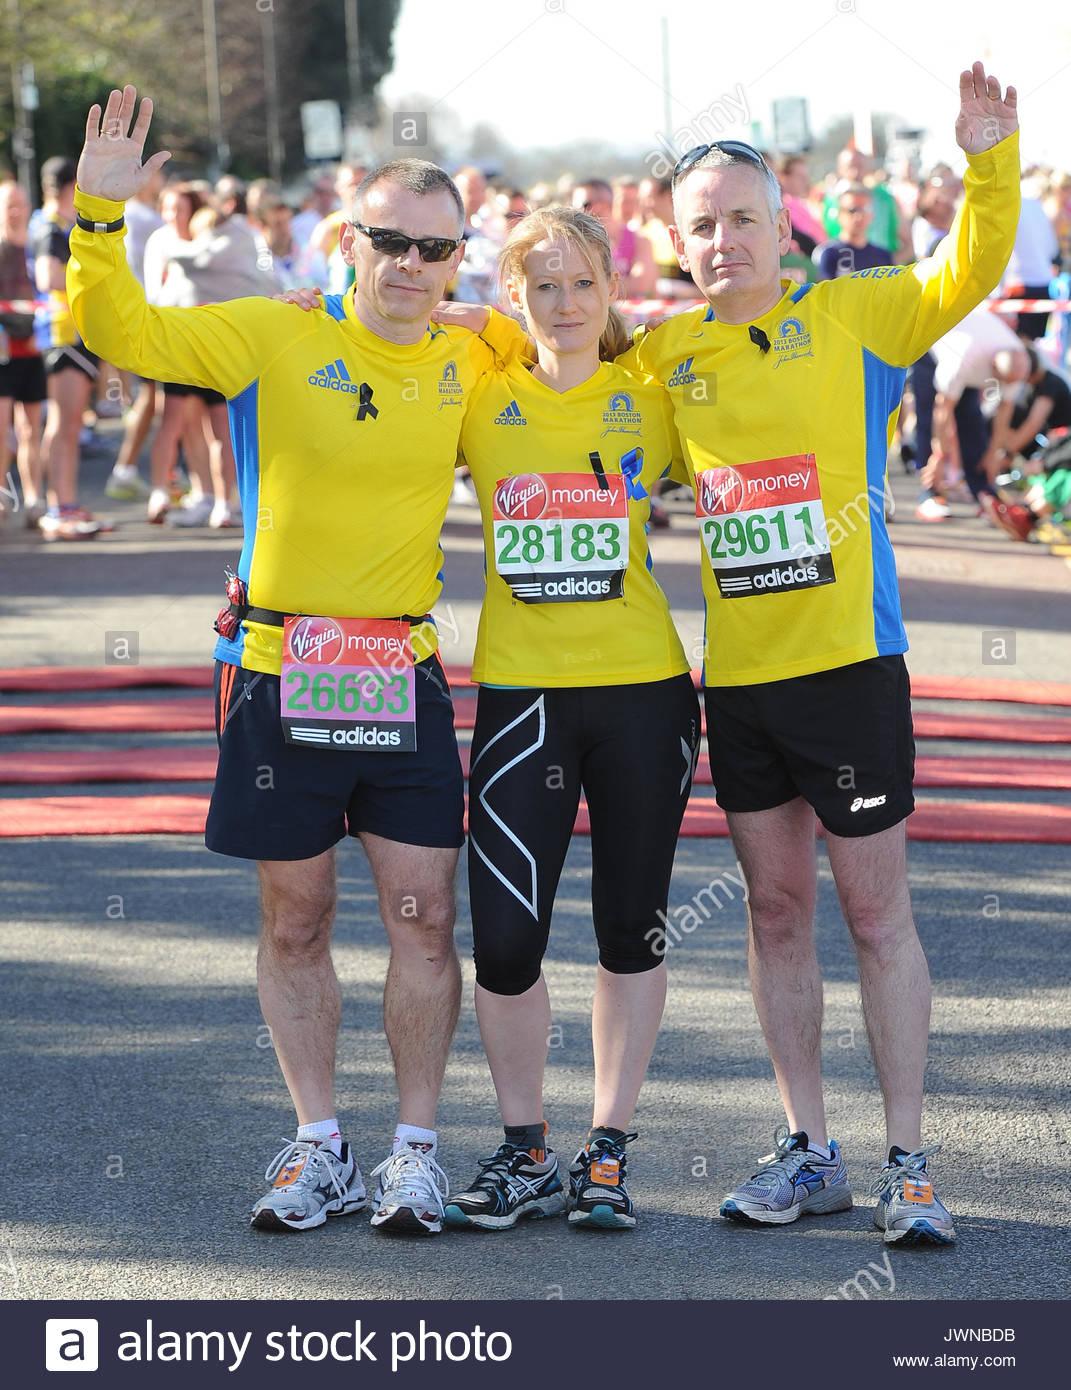 London Marathon 2018: Mo Farah finishes third as Eliud ...